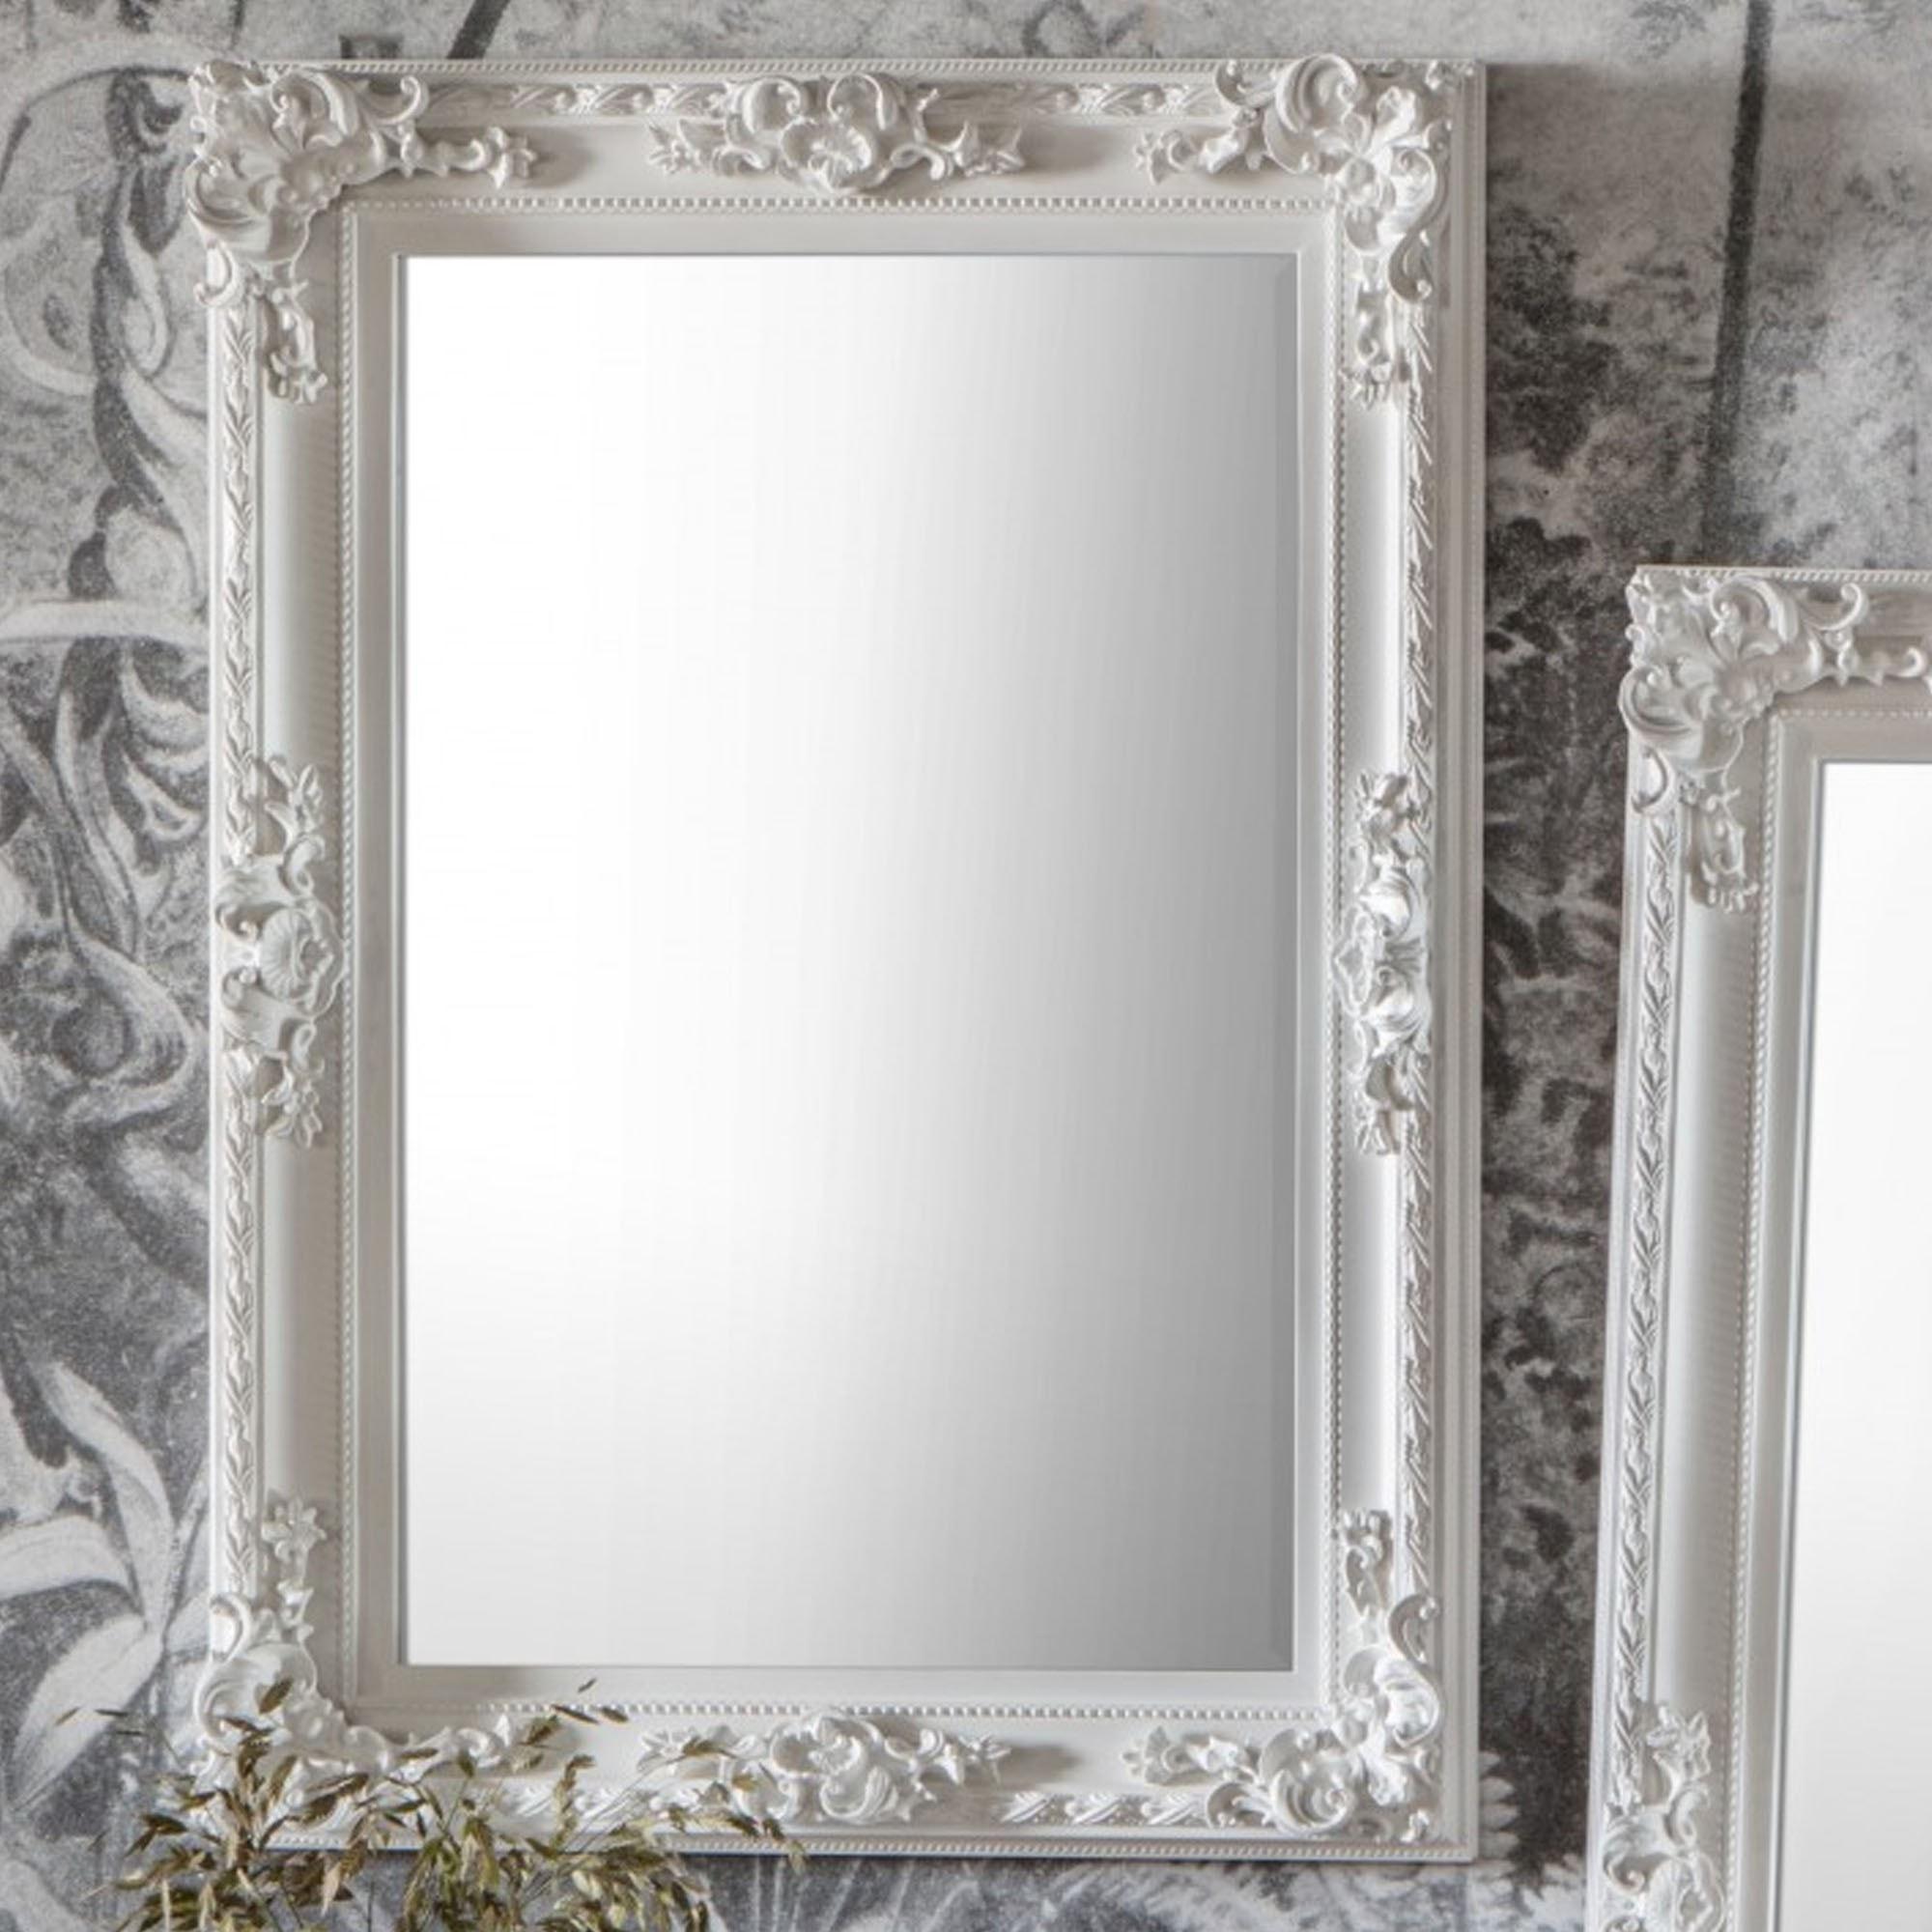 altori-antique-french-style-rectangle-mi